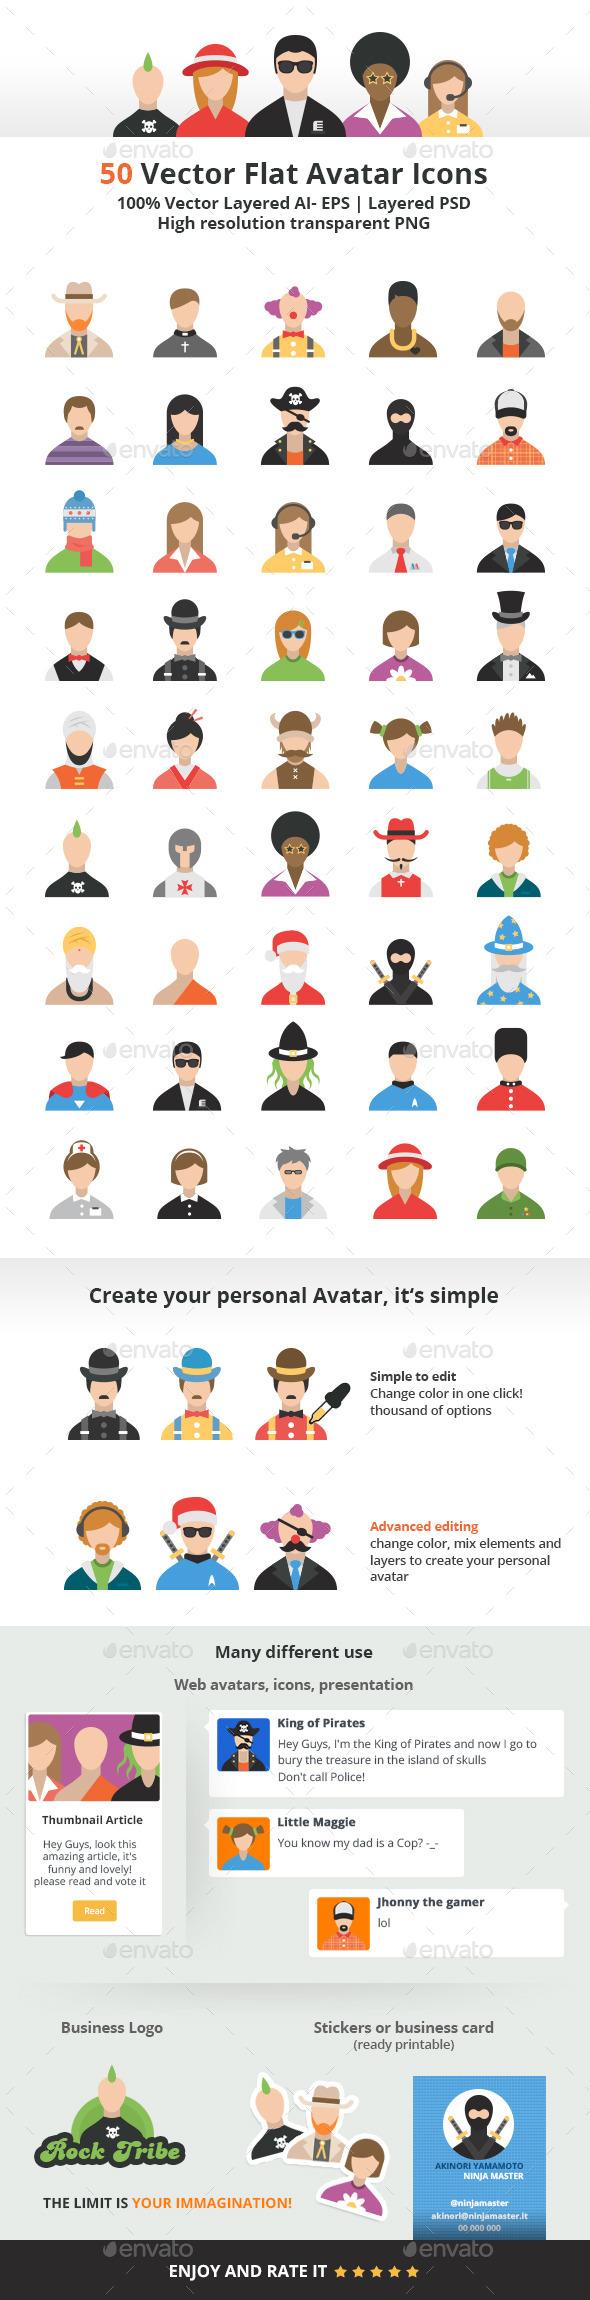 50 Vector Flat Avatars Icons